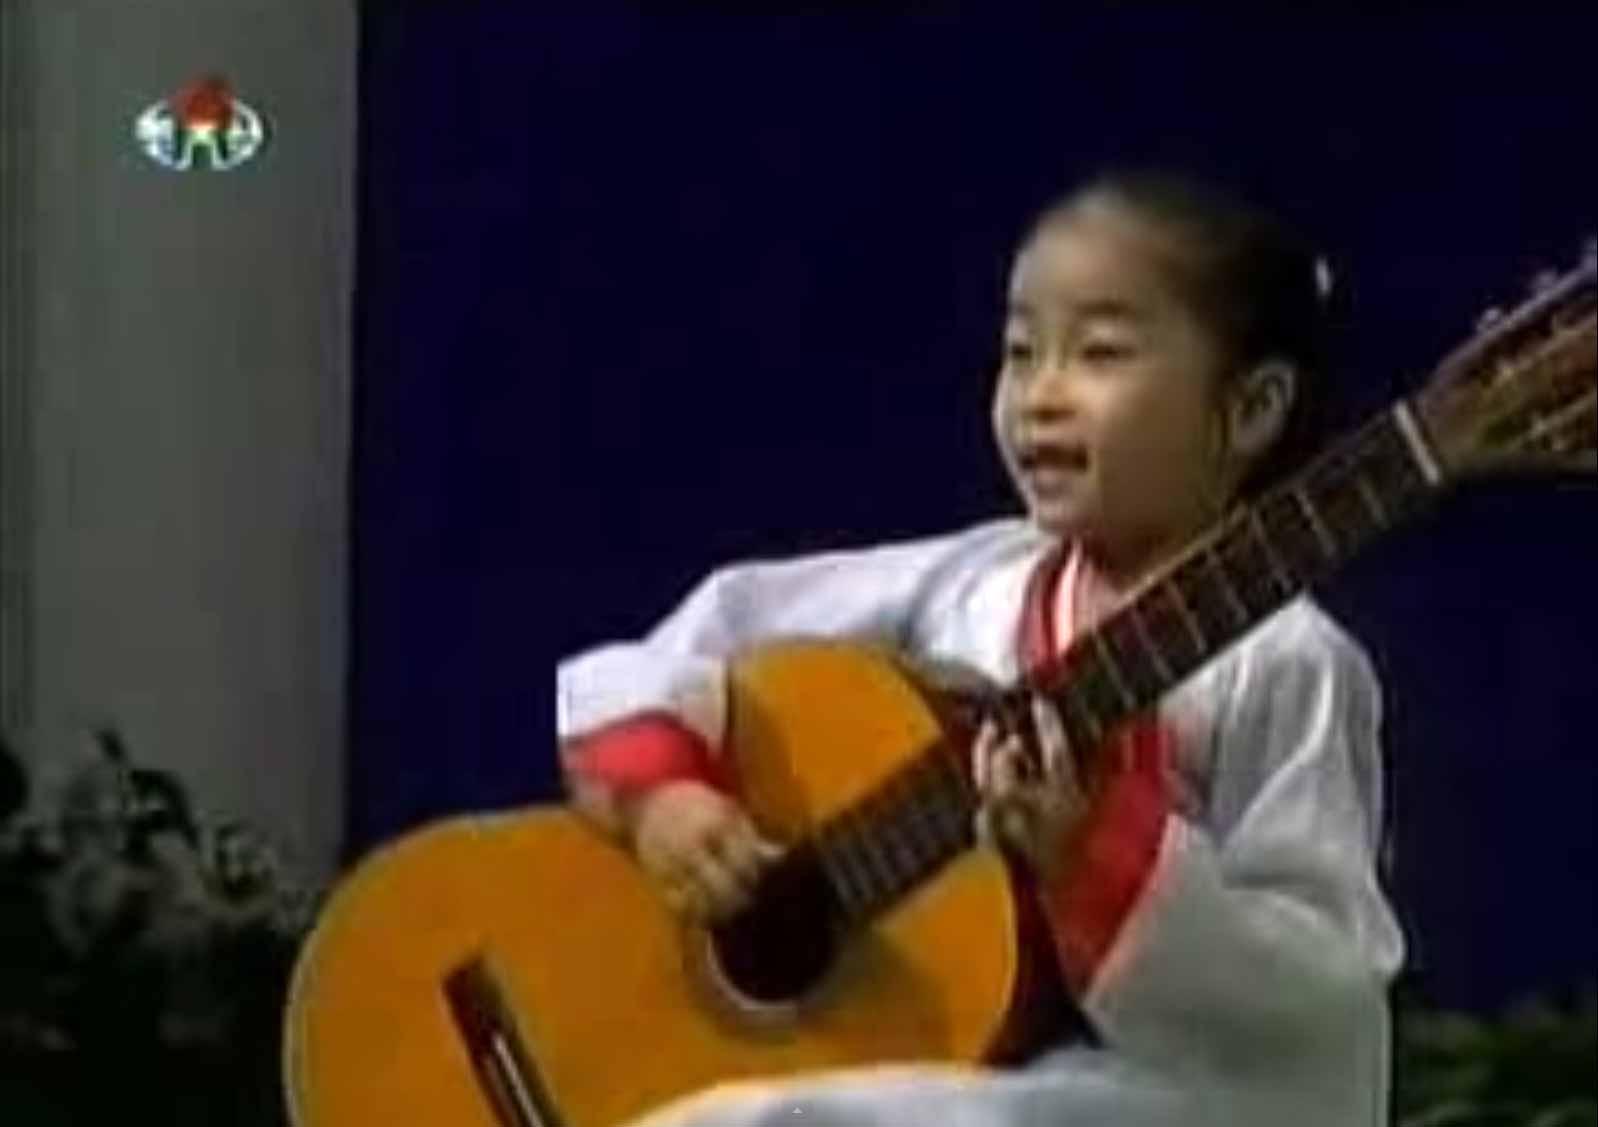 North korean girl playing guitar